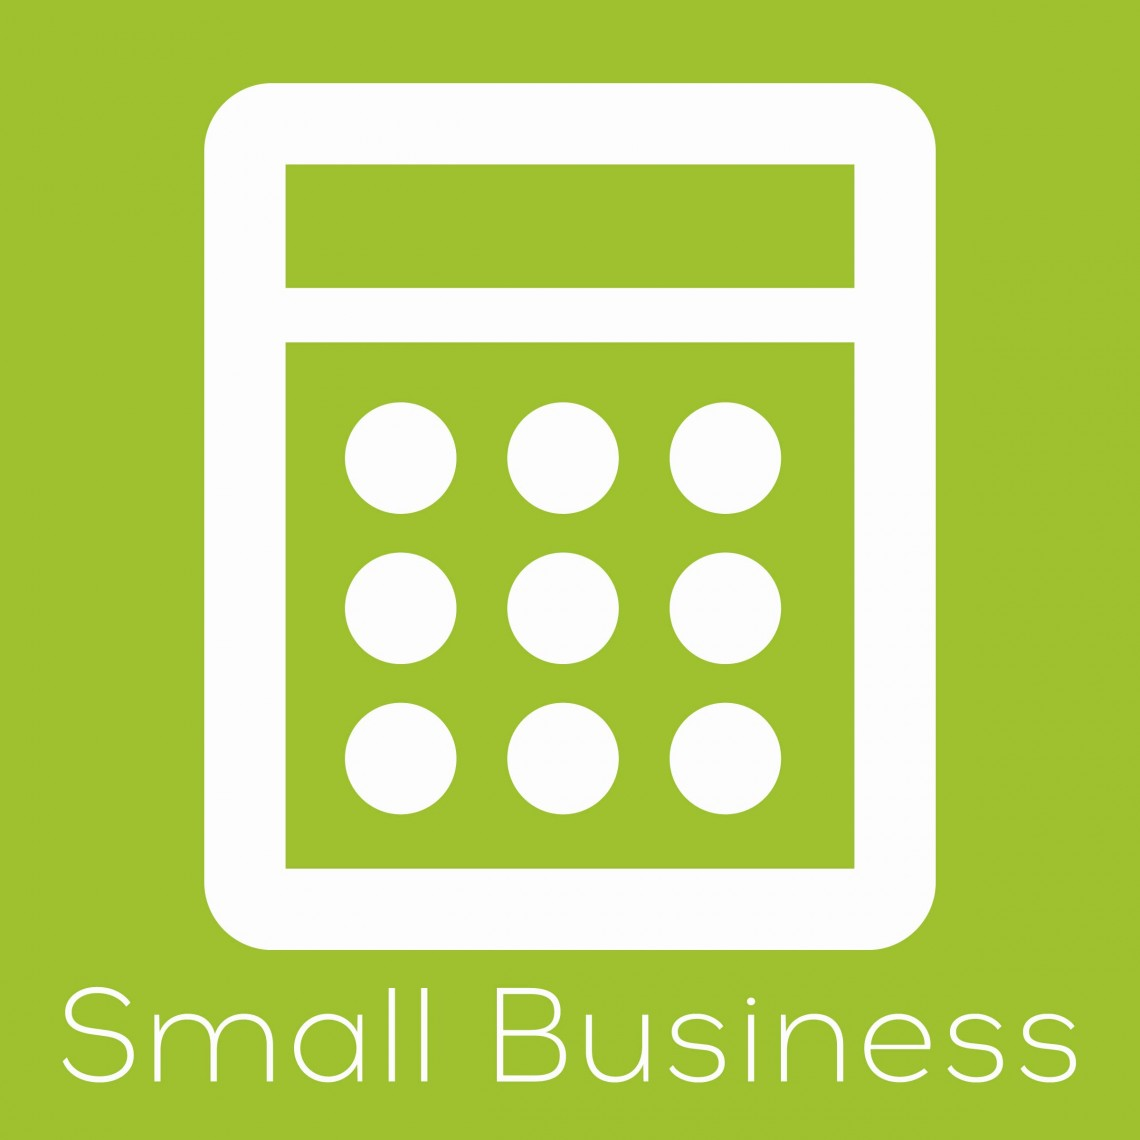 Small Business Training